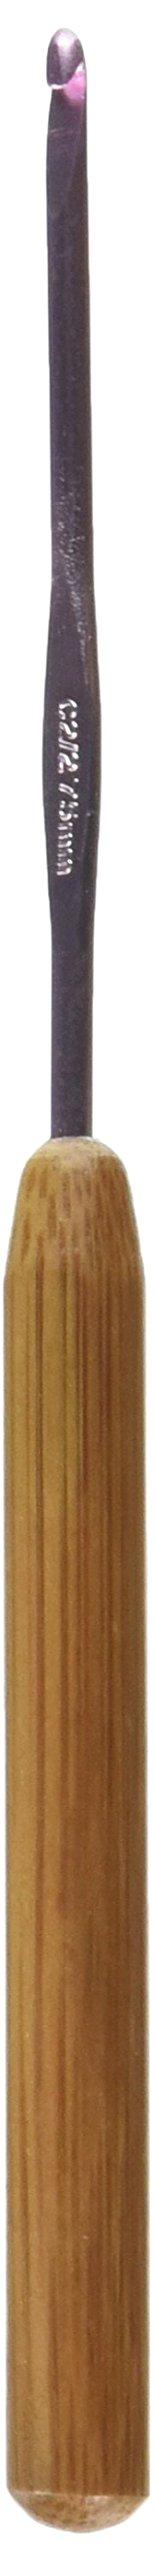 Susan Bates - 13206-C 2 Aguja de Crochet de 2,75mm